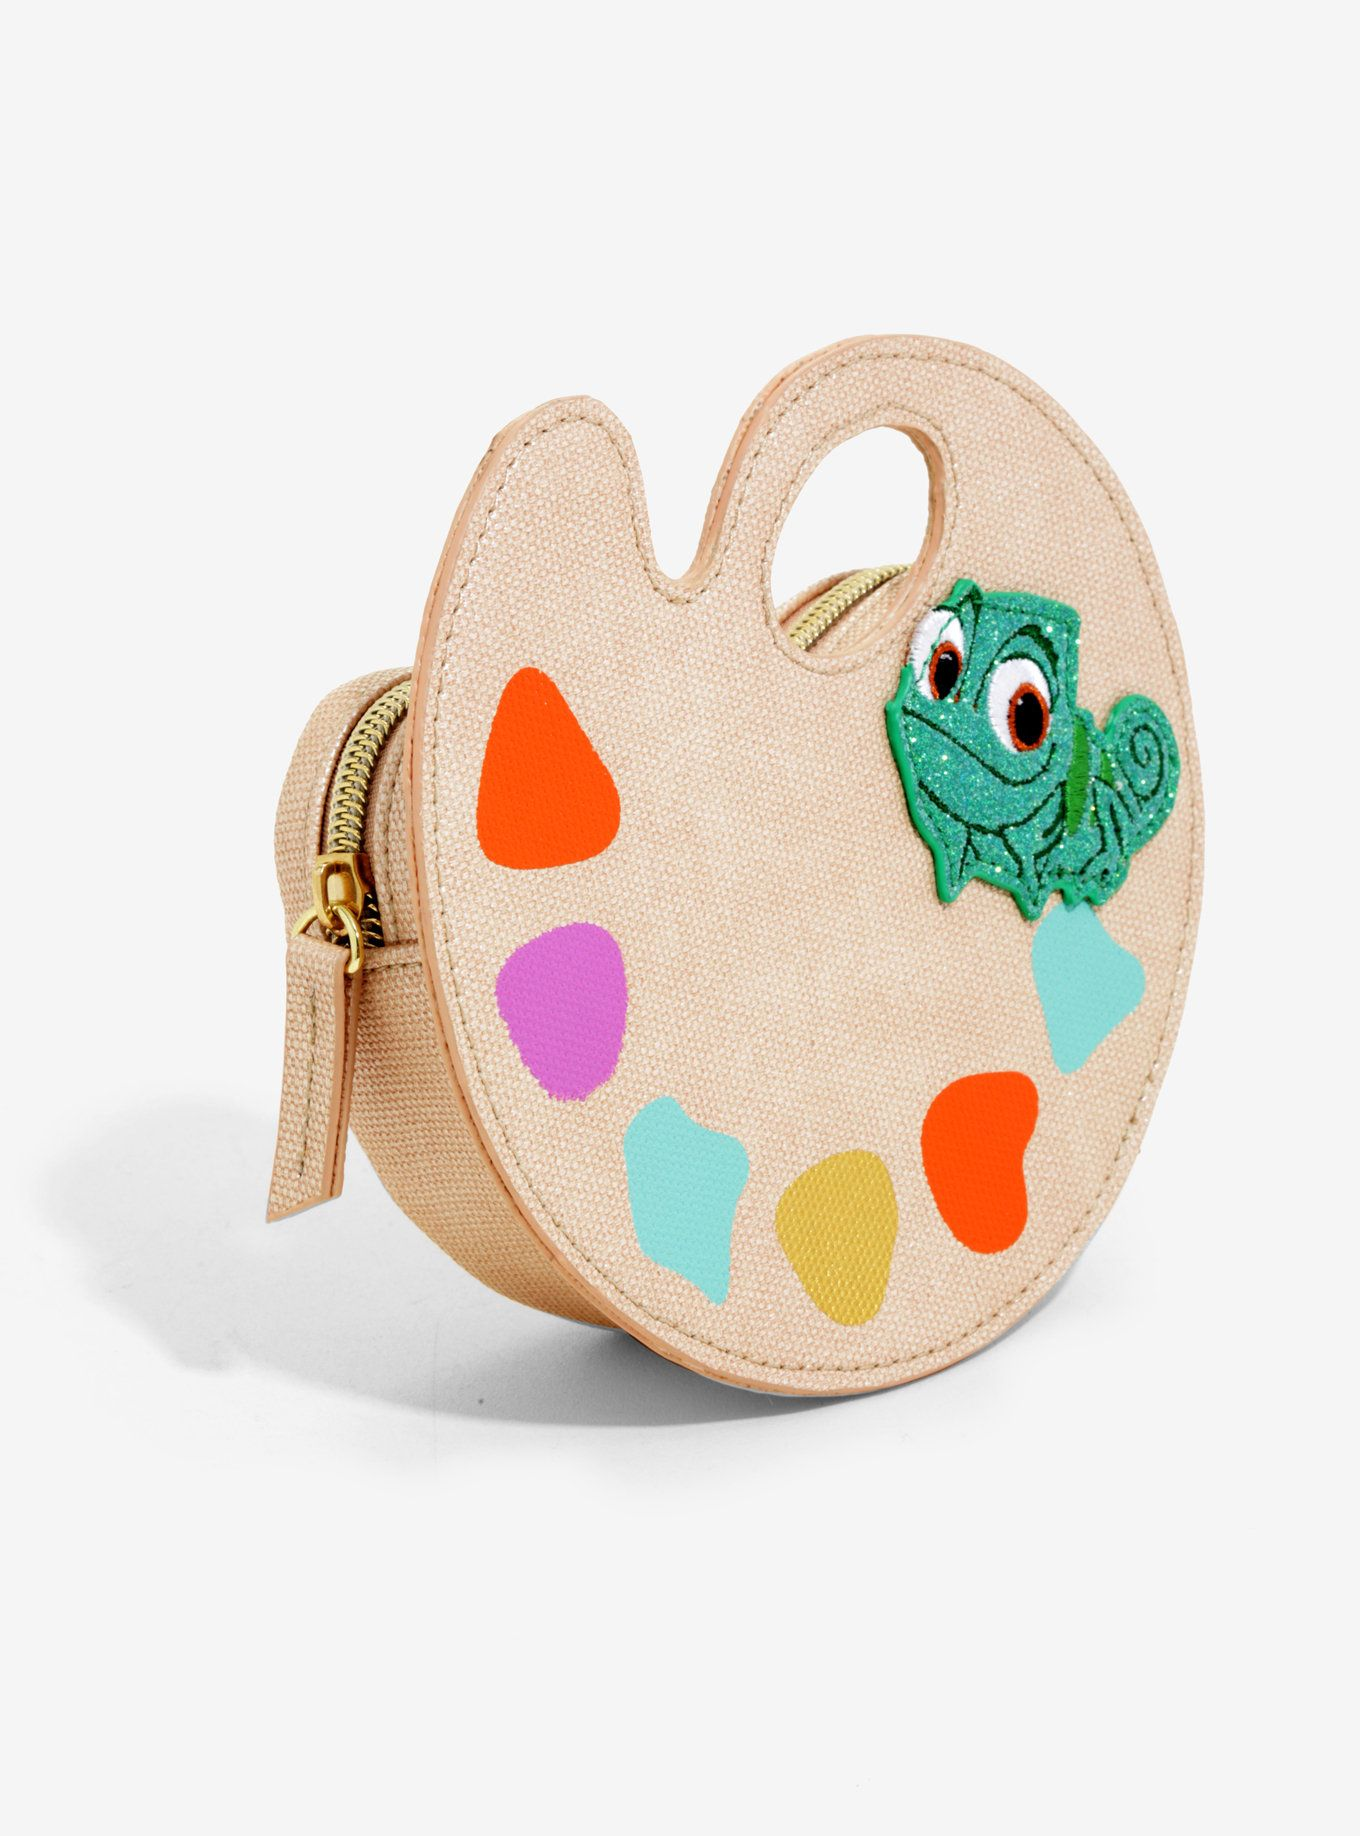 693a98a9cc6 Danielle Nicole Disney Tangled Pascal Makeup Bag